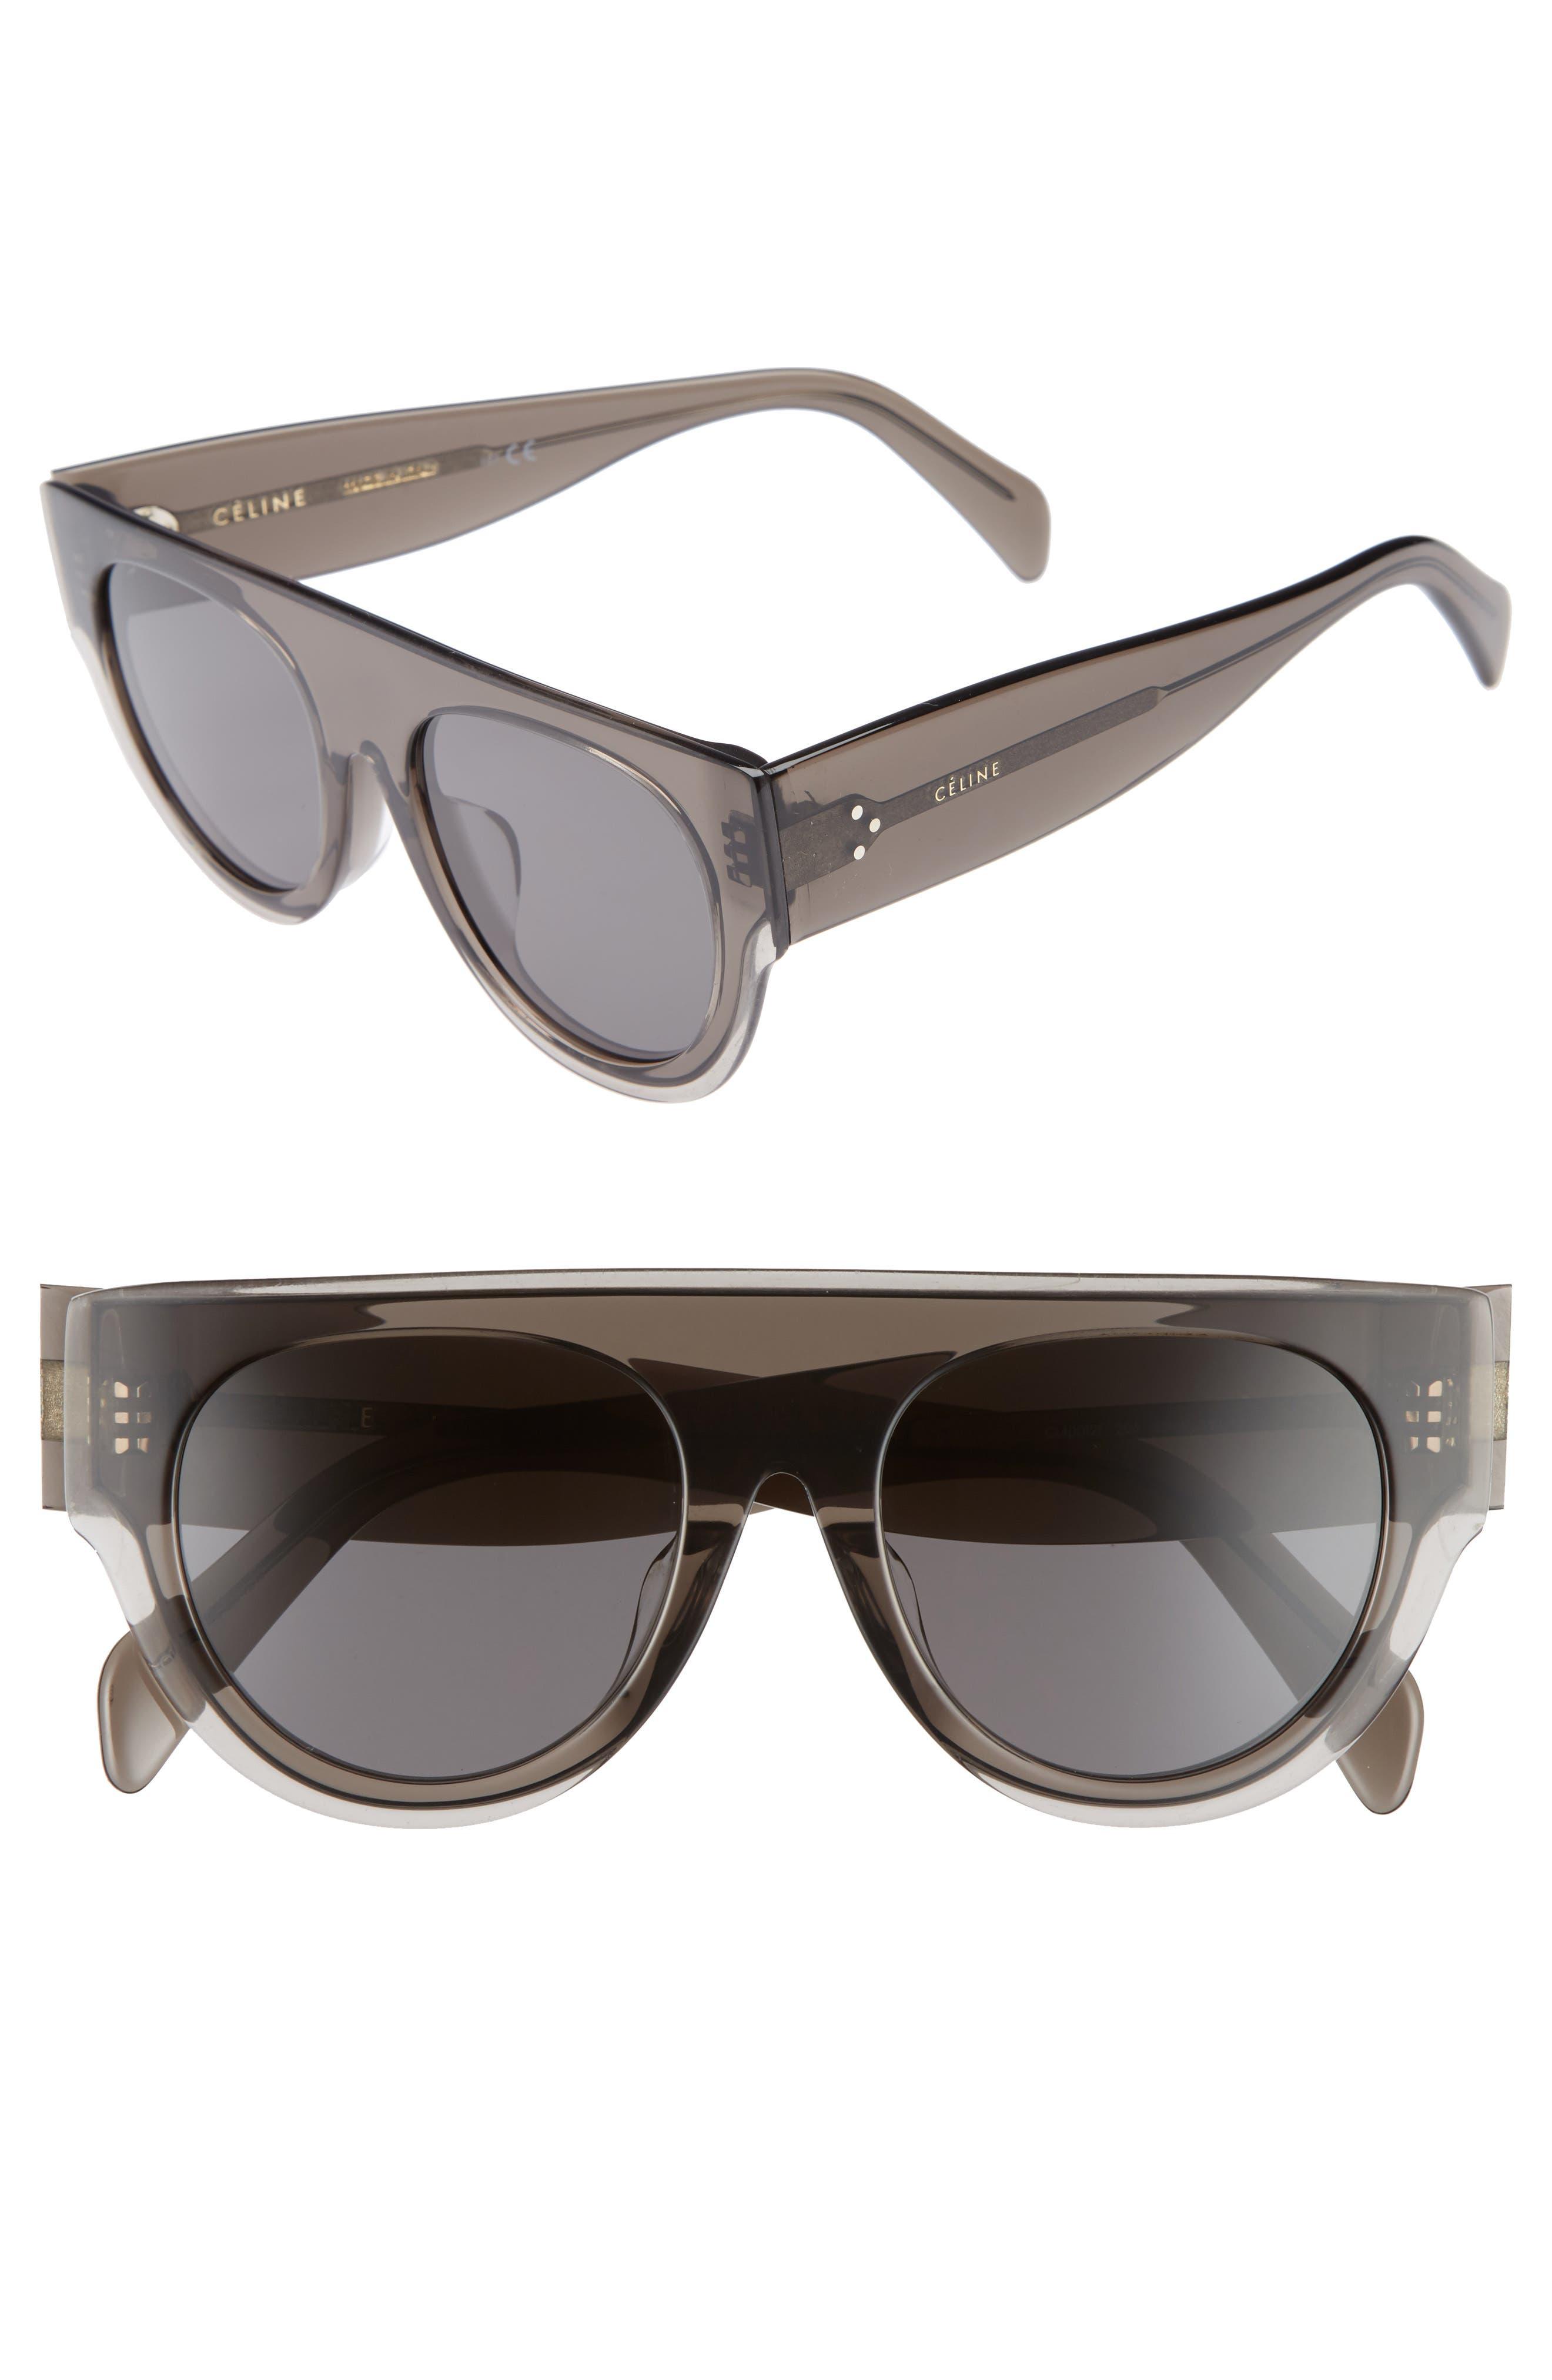 52mm Pilot Sunglasses,                         Main,                         color, DARK GREY/ SMOKE